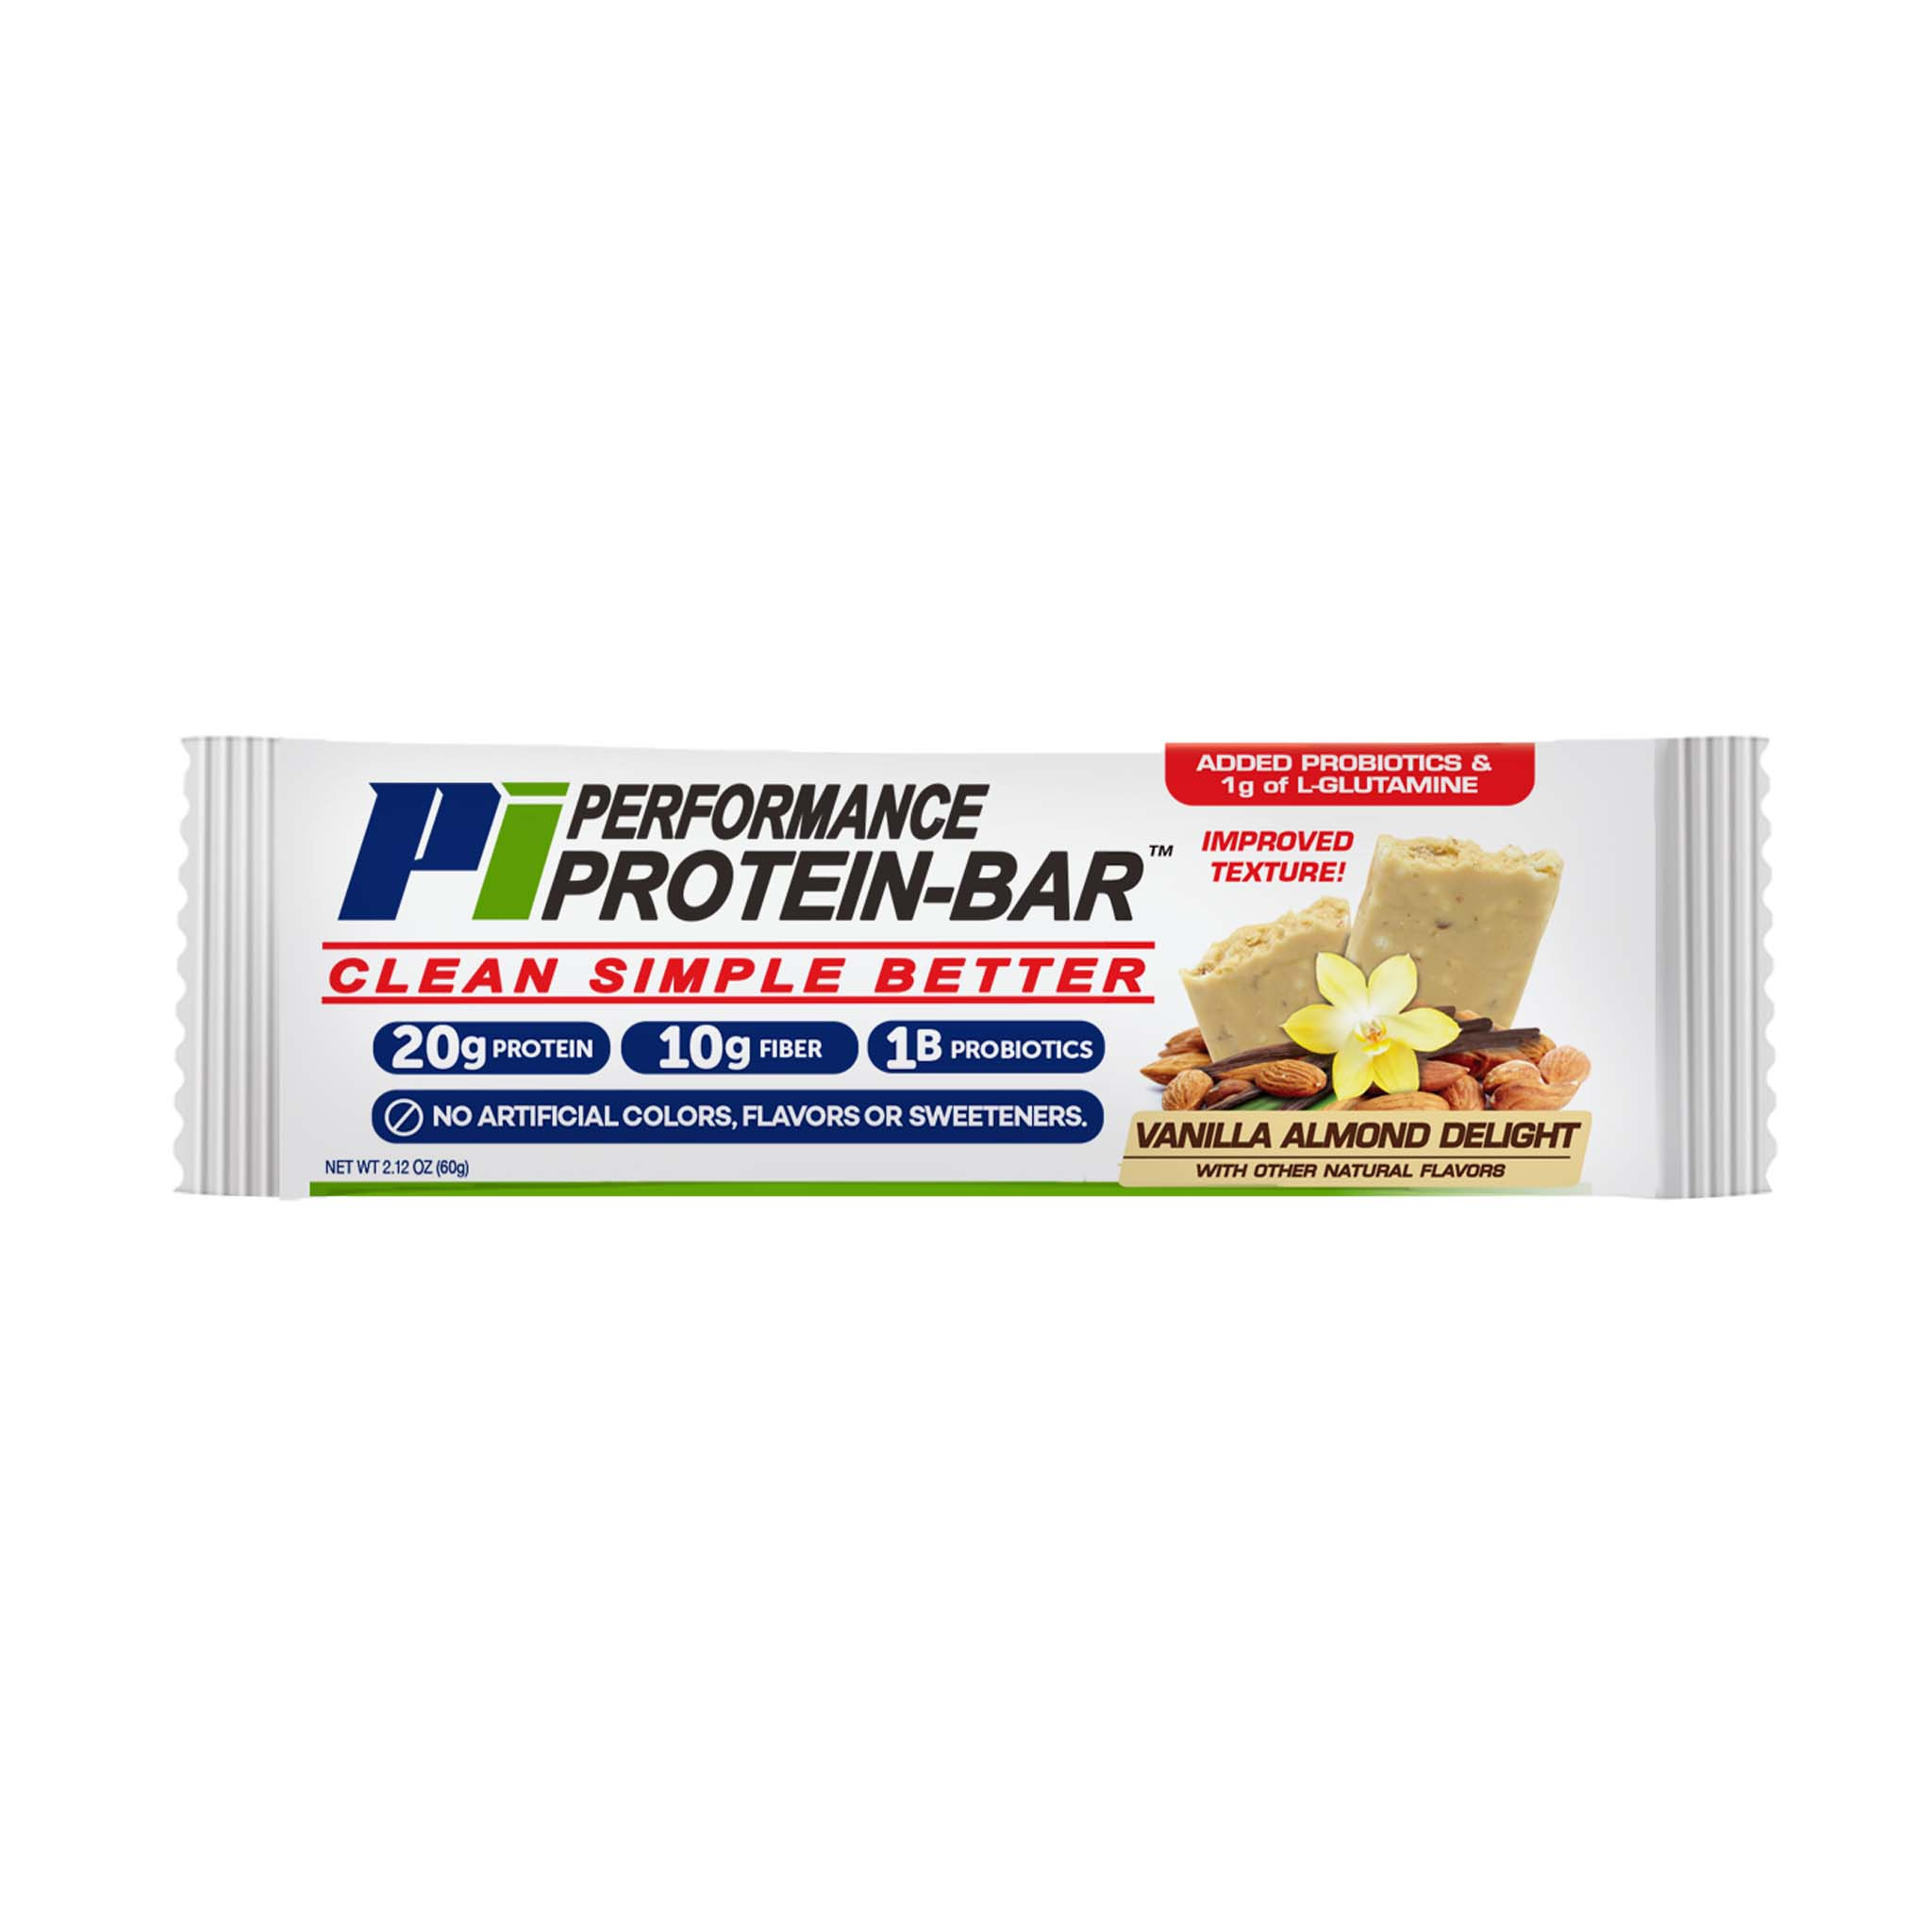 va-protein bar